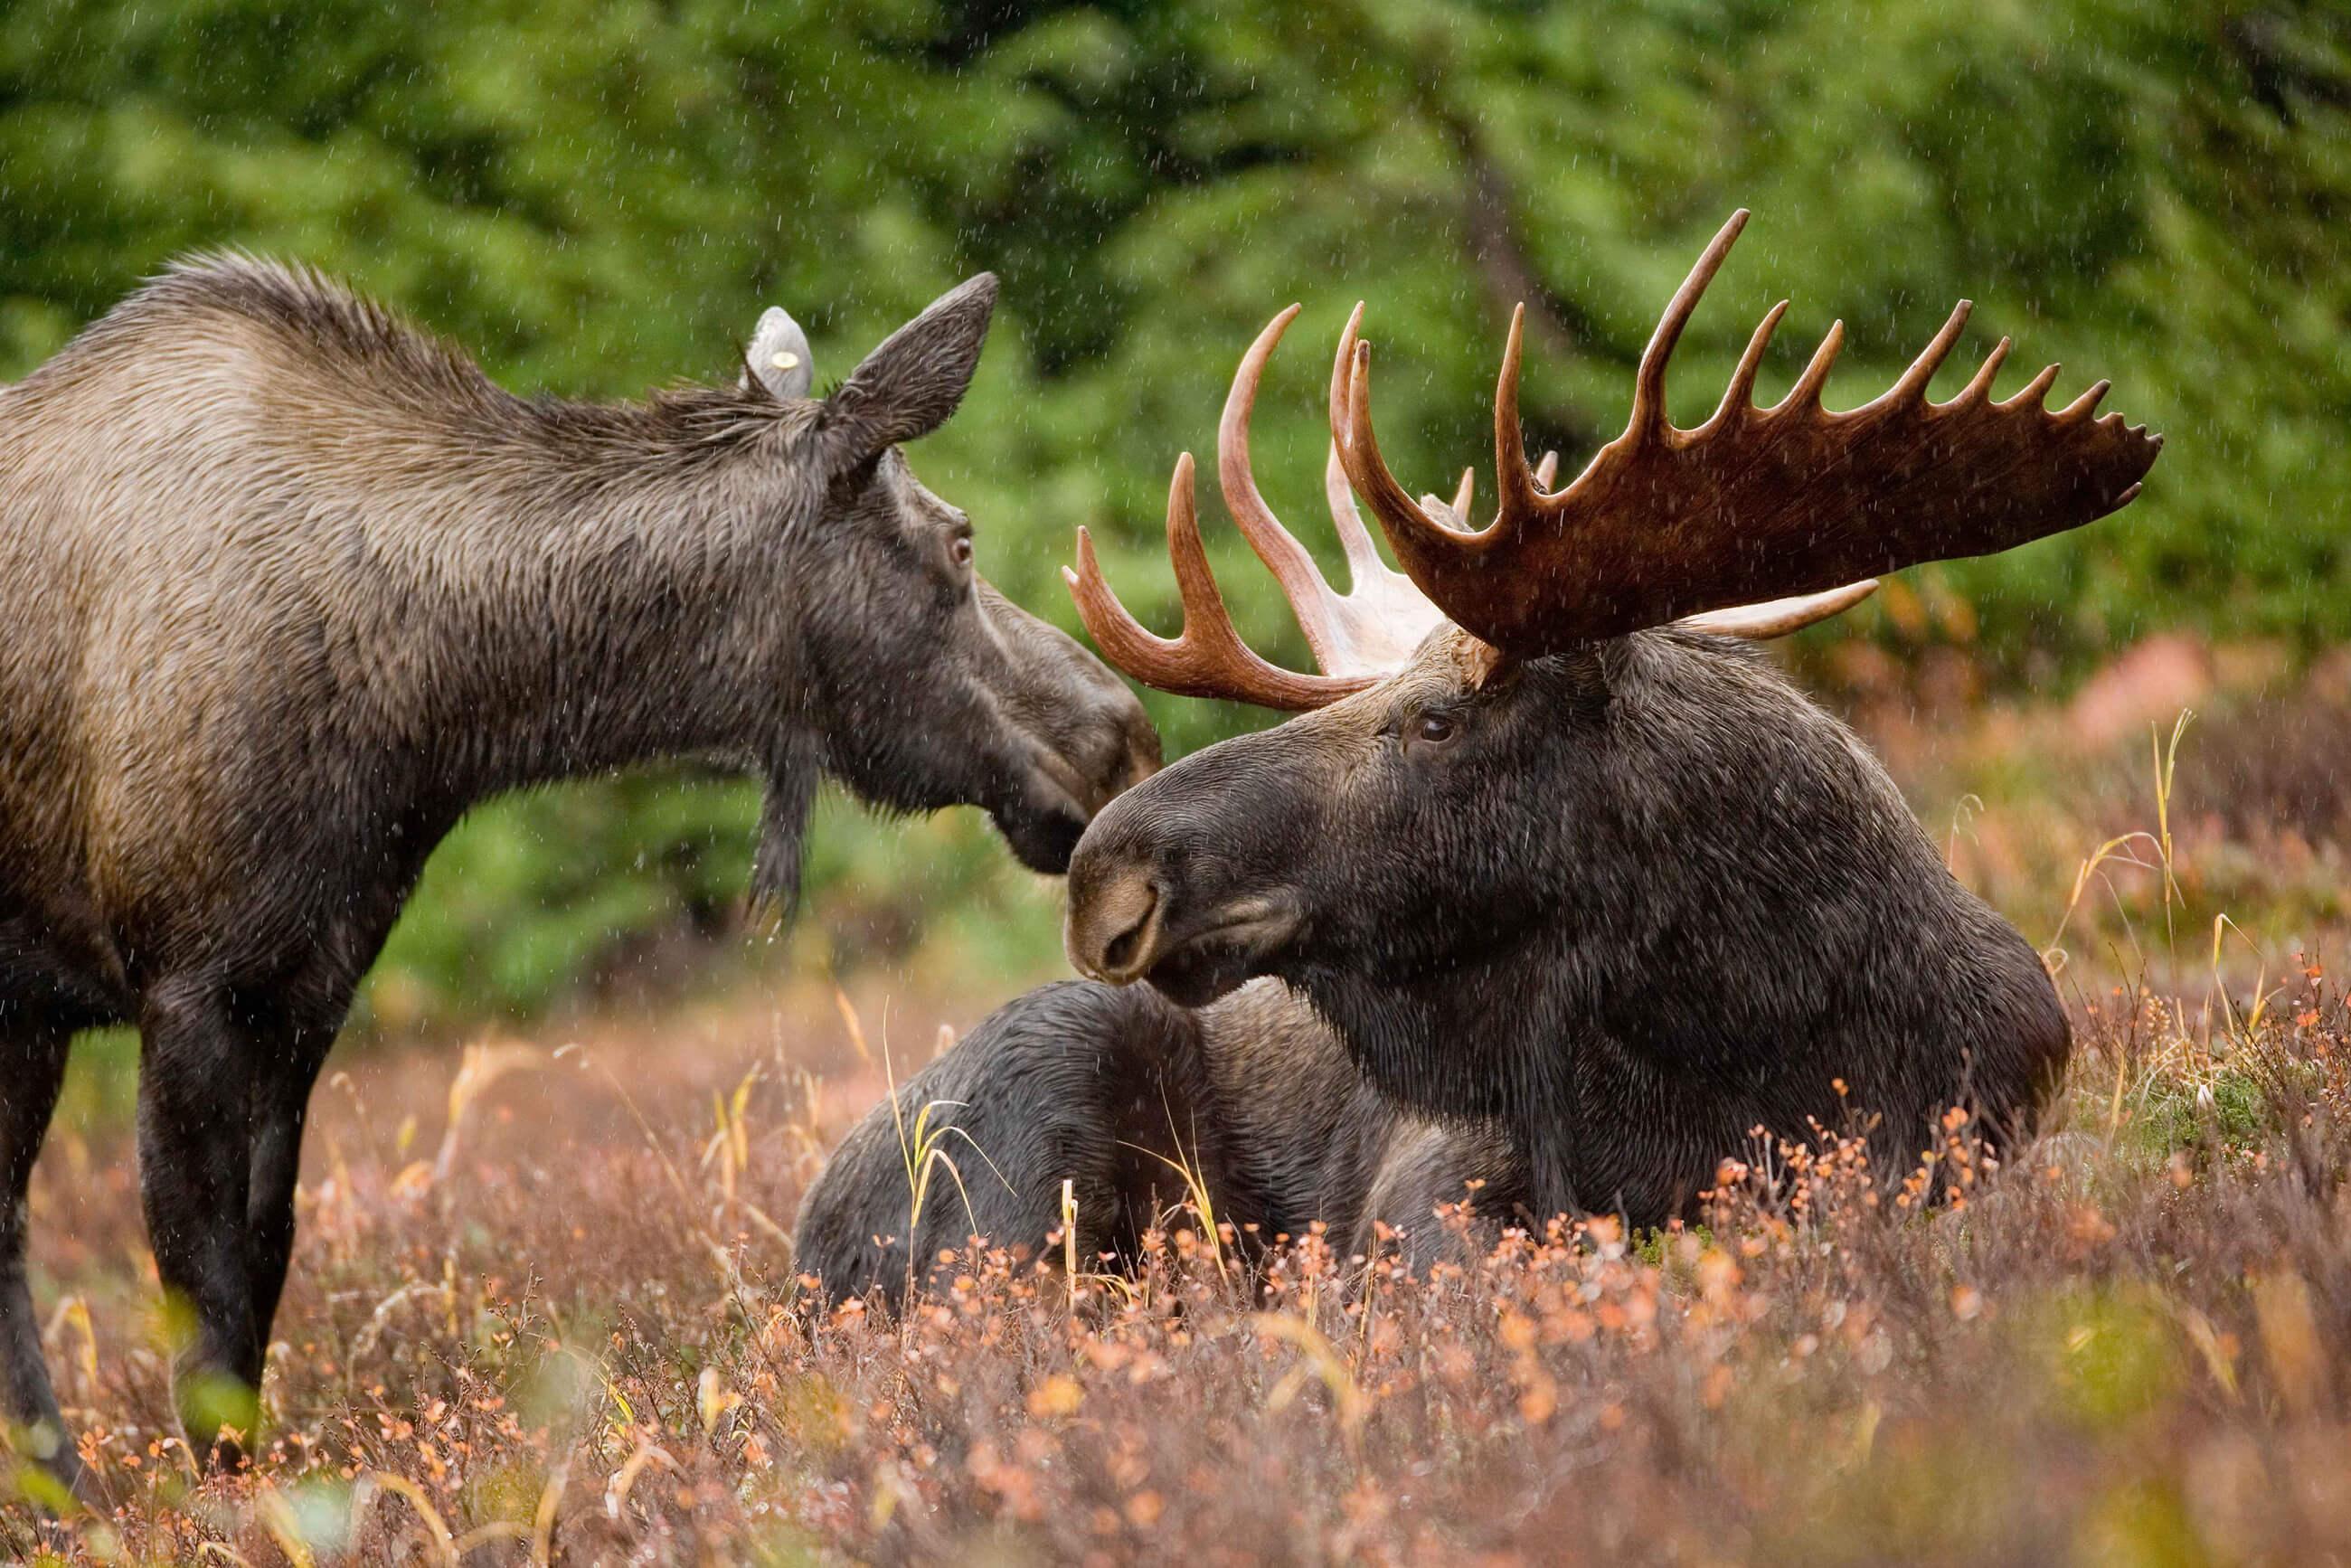 https://bubo.sk/uploads/galleries/16051/moose-591110-1.jpg